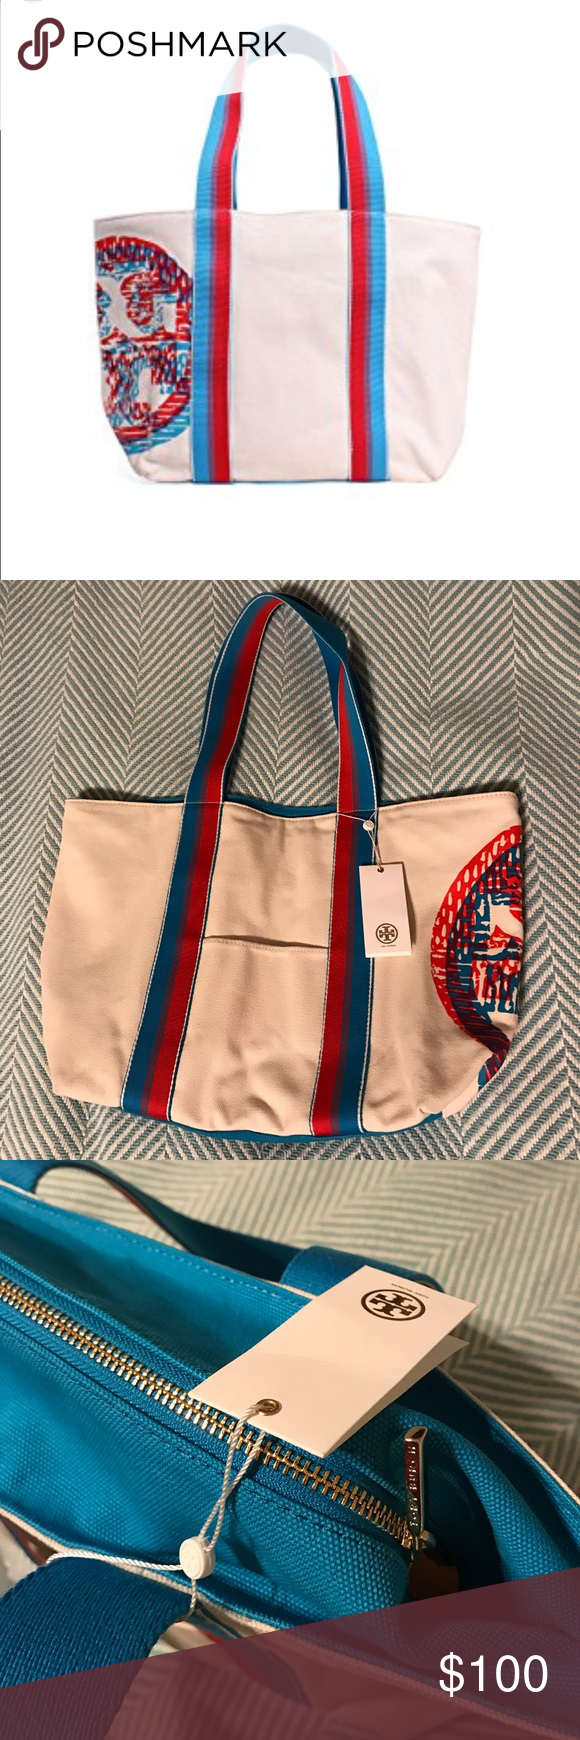 Tory Burch canvas NWT Canvas beach small tote bag. Tory Burch Bags Totes